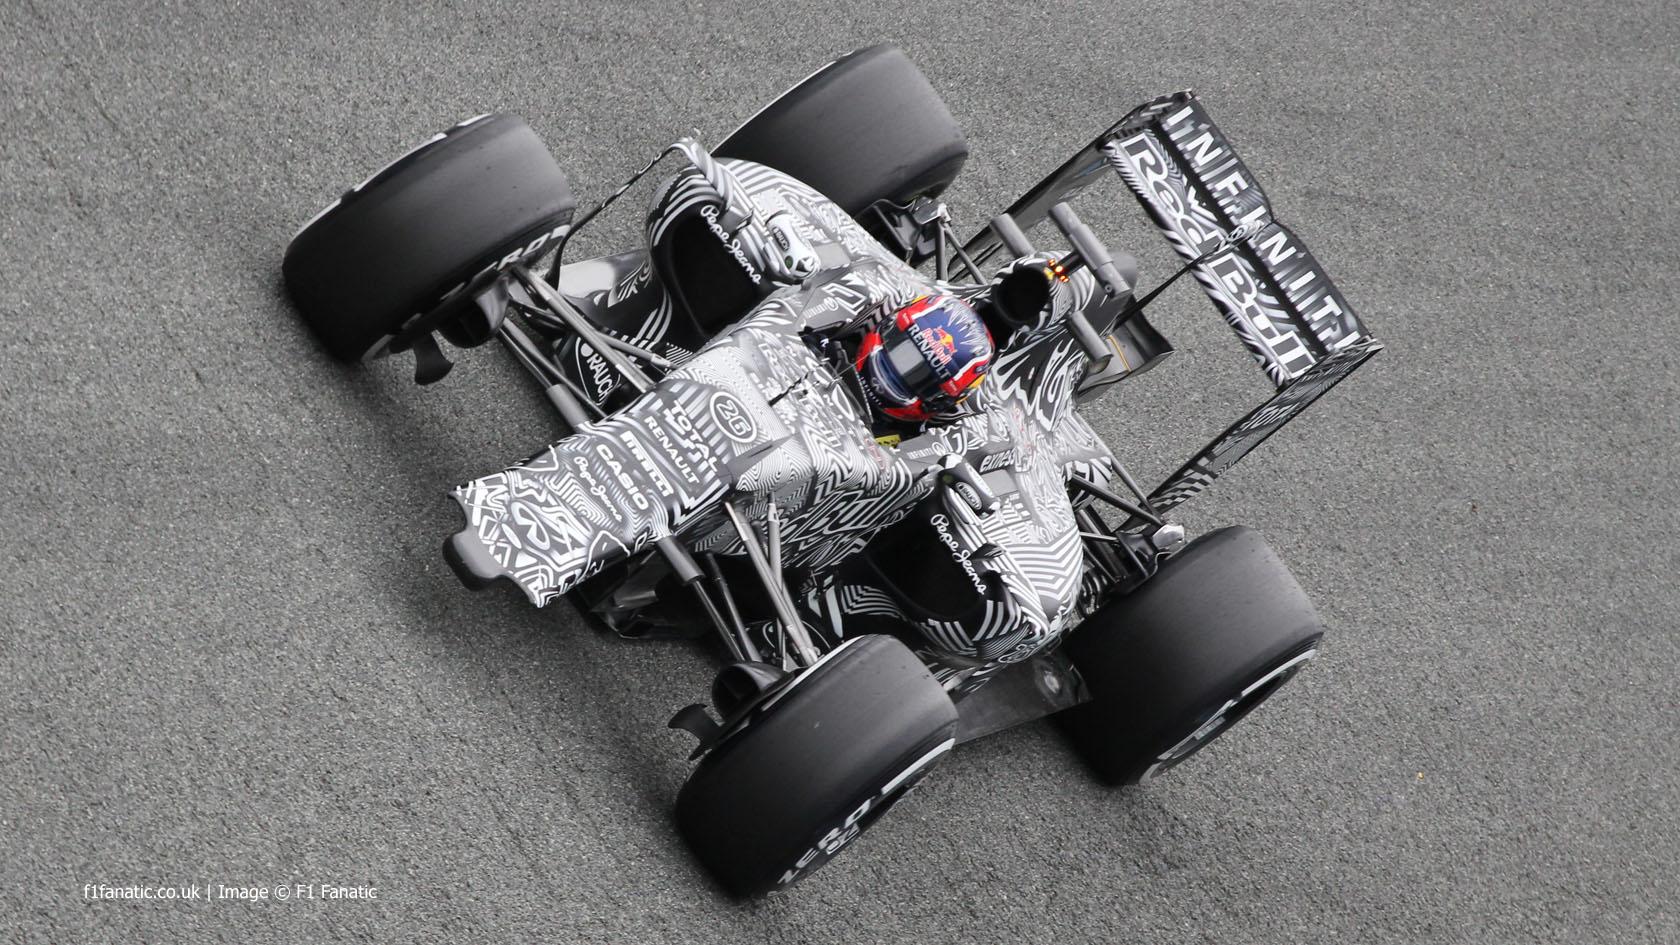 [F1] Pierre Gasly Kvya1